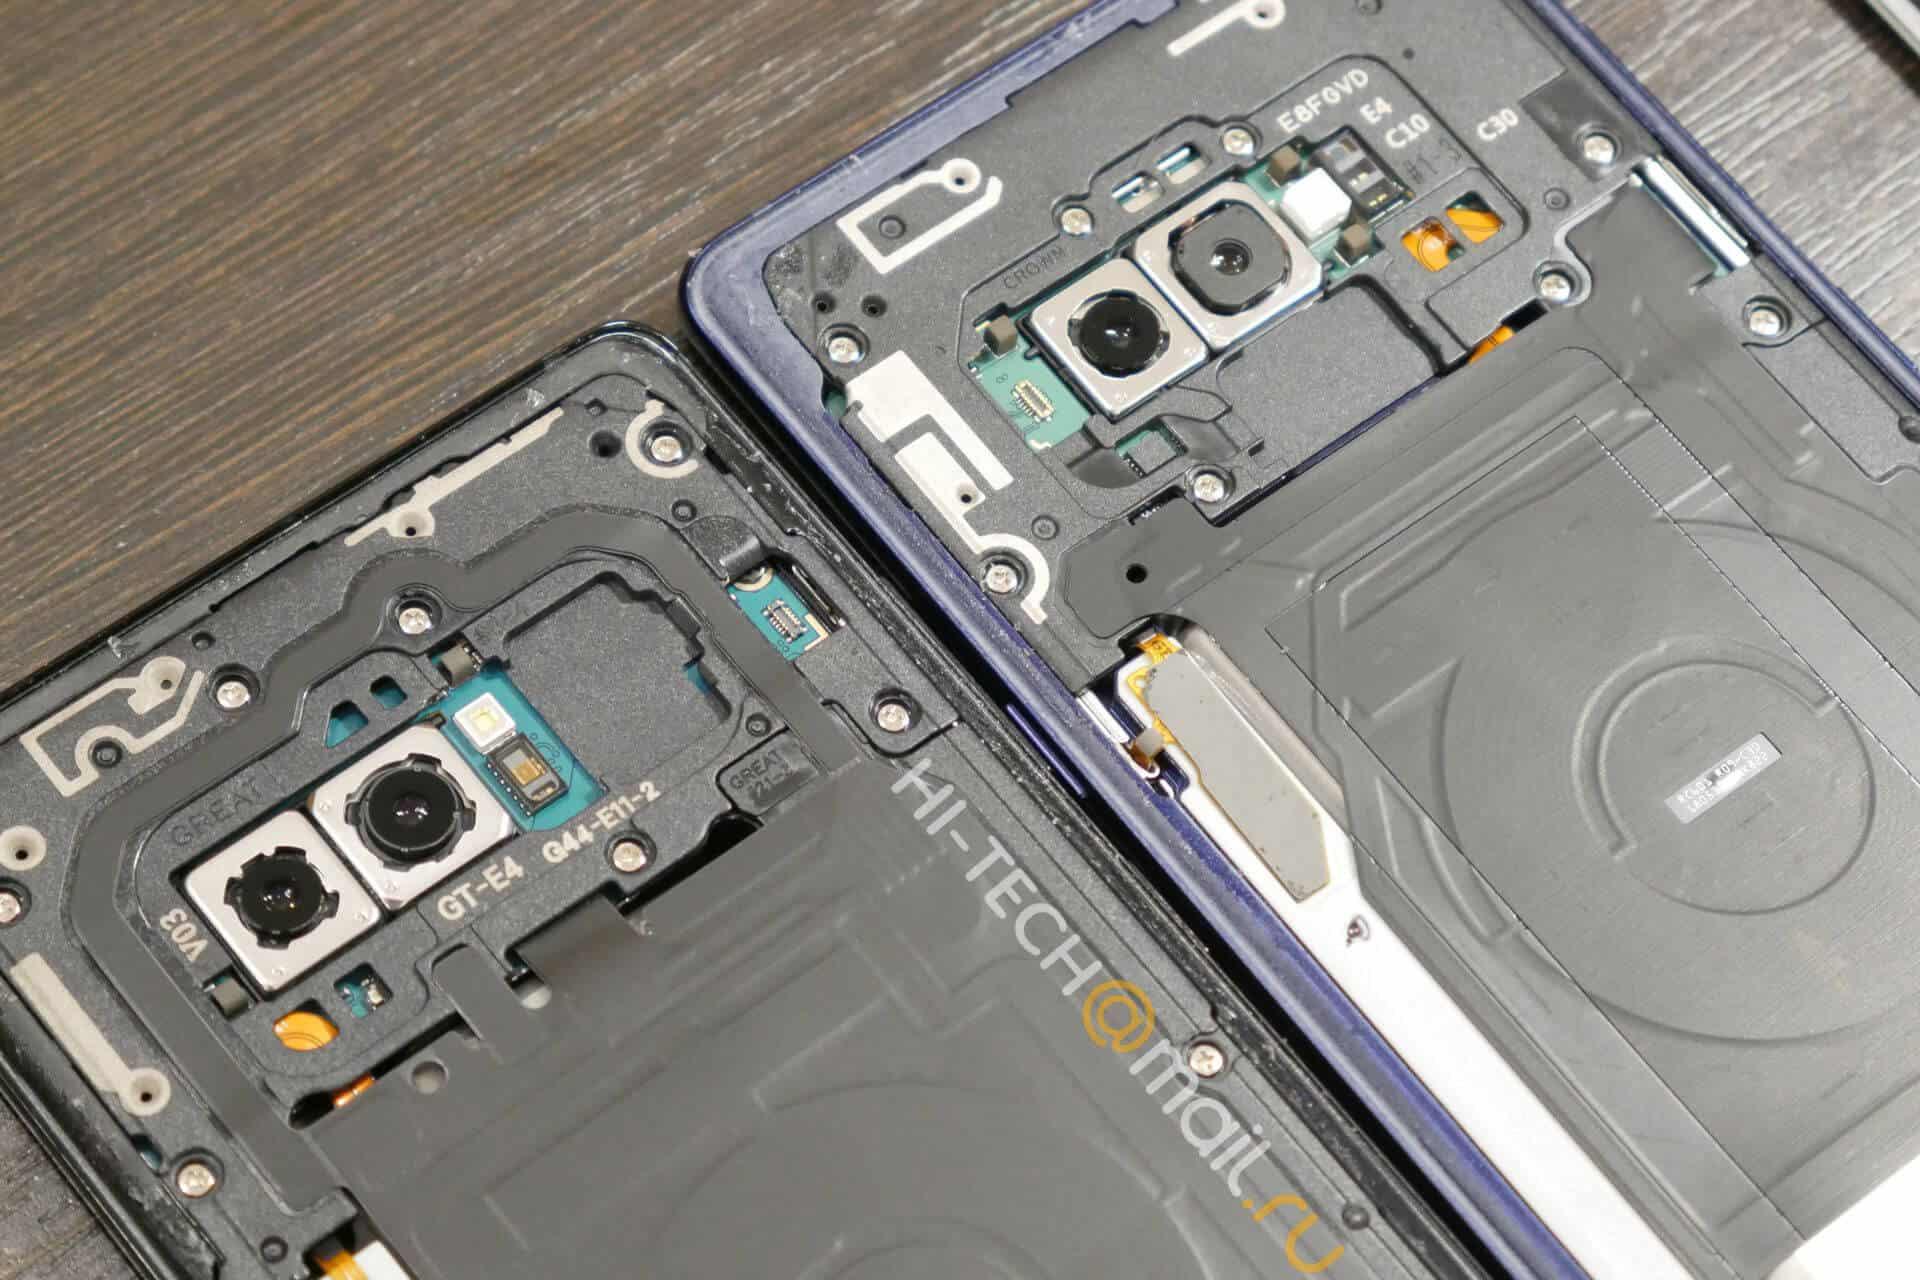 Galaxy Note 8 v Galaxy Note 9 teardown from Hi Tech Mail RU 01